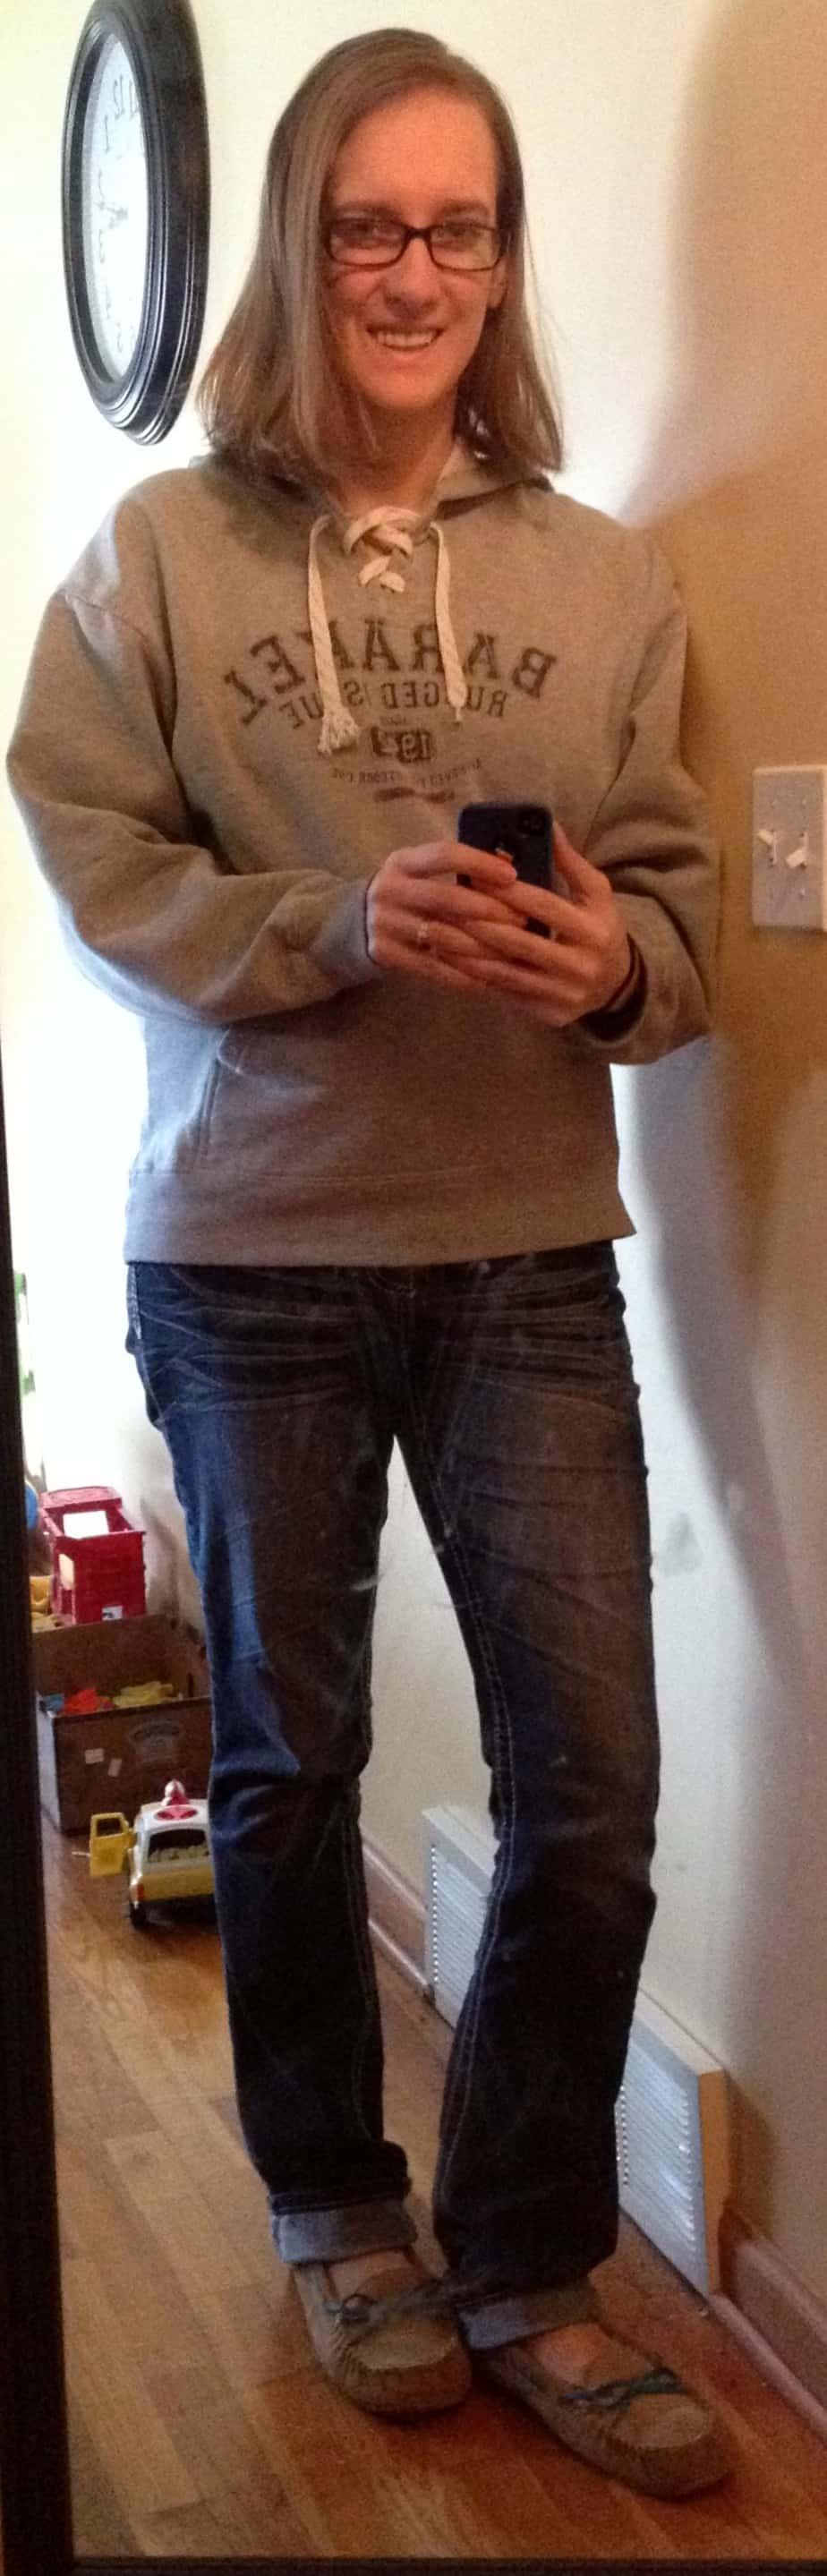 Camp Barakel sweatshirt, jeans, slippers